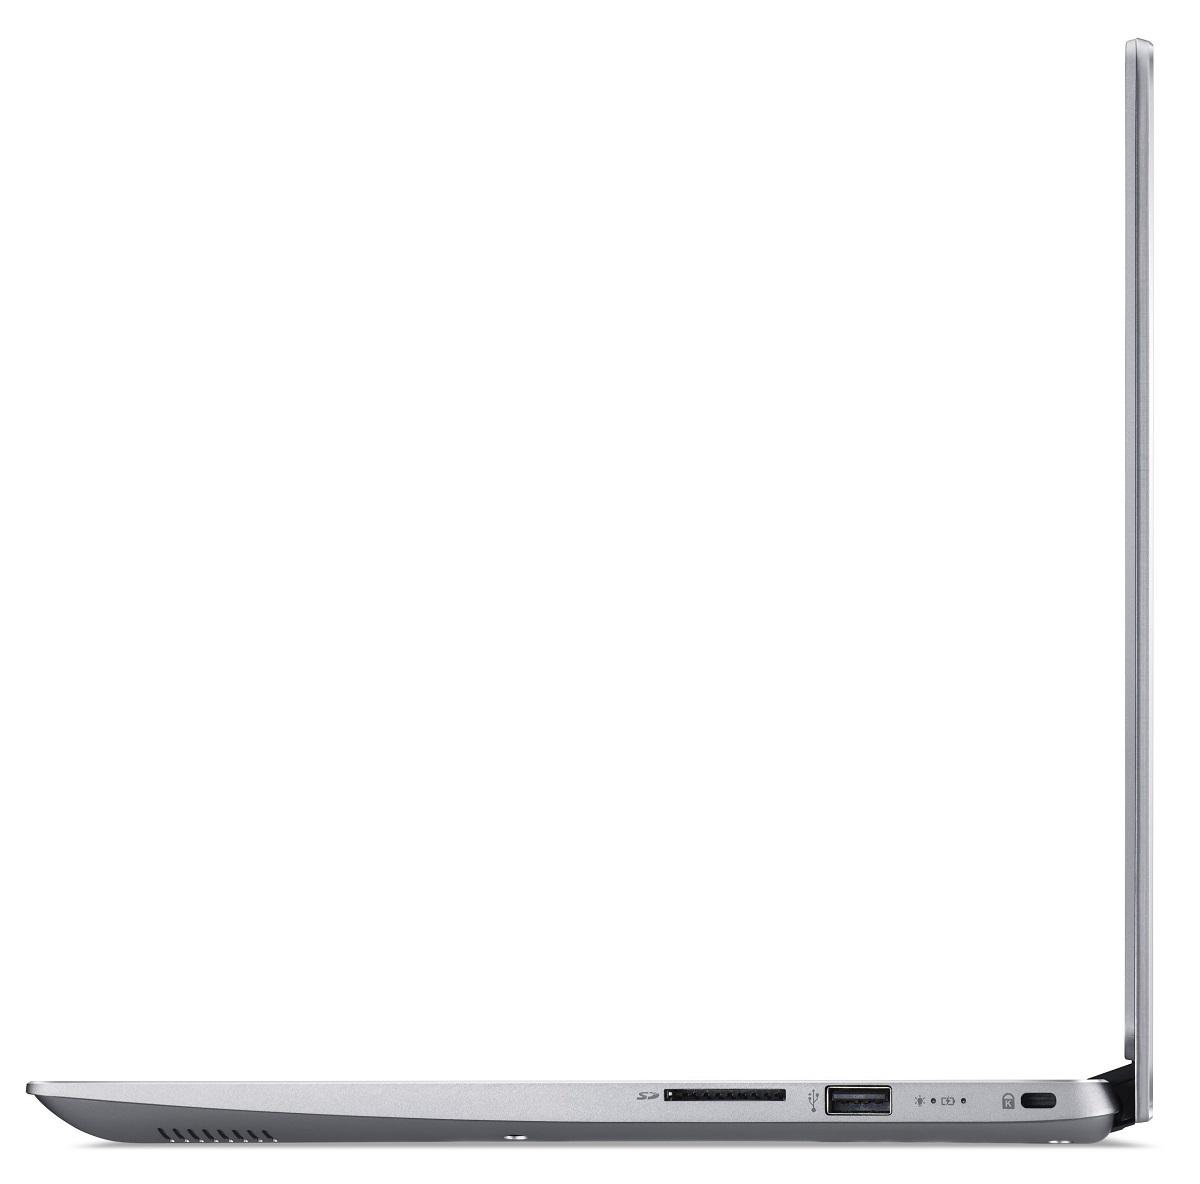 85ece2a03a5e acer Swift 3 Ultrabook - SF314-54-38UF - Ezüst - Már 2 Év ...